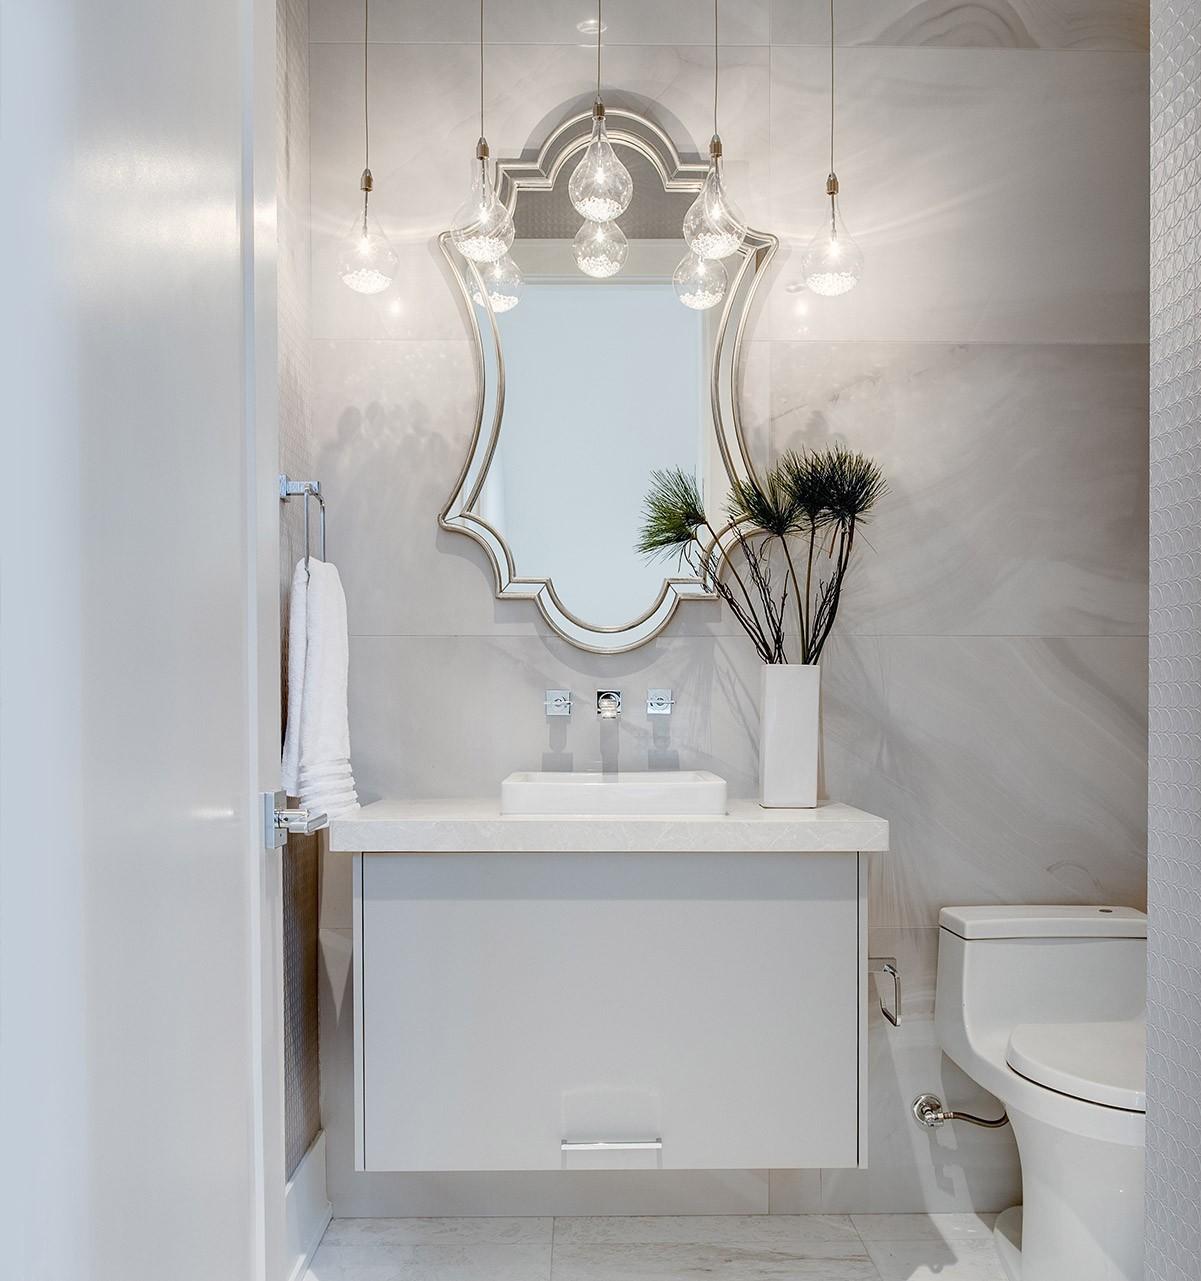 Modern Bathroom Cabinets Canada | Bathroom Vanities Surrey | Sunrise ...